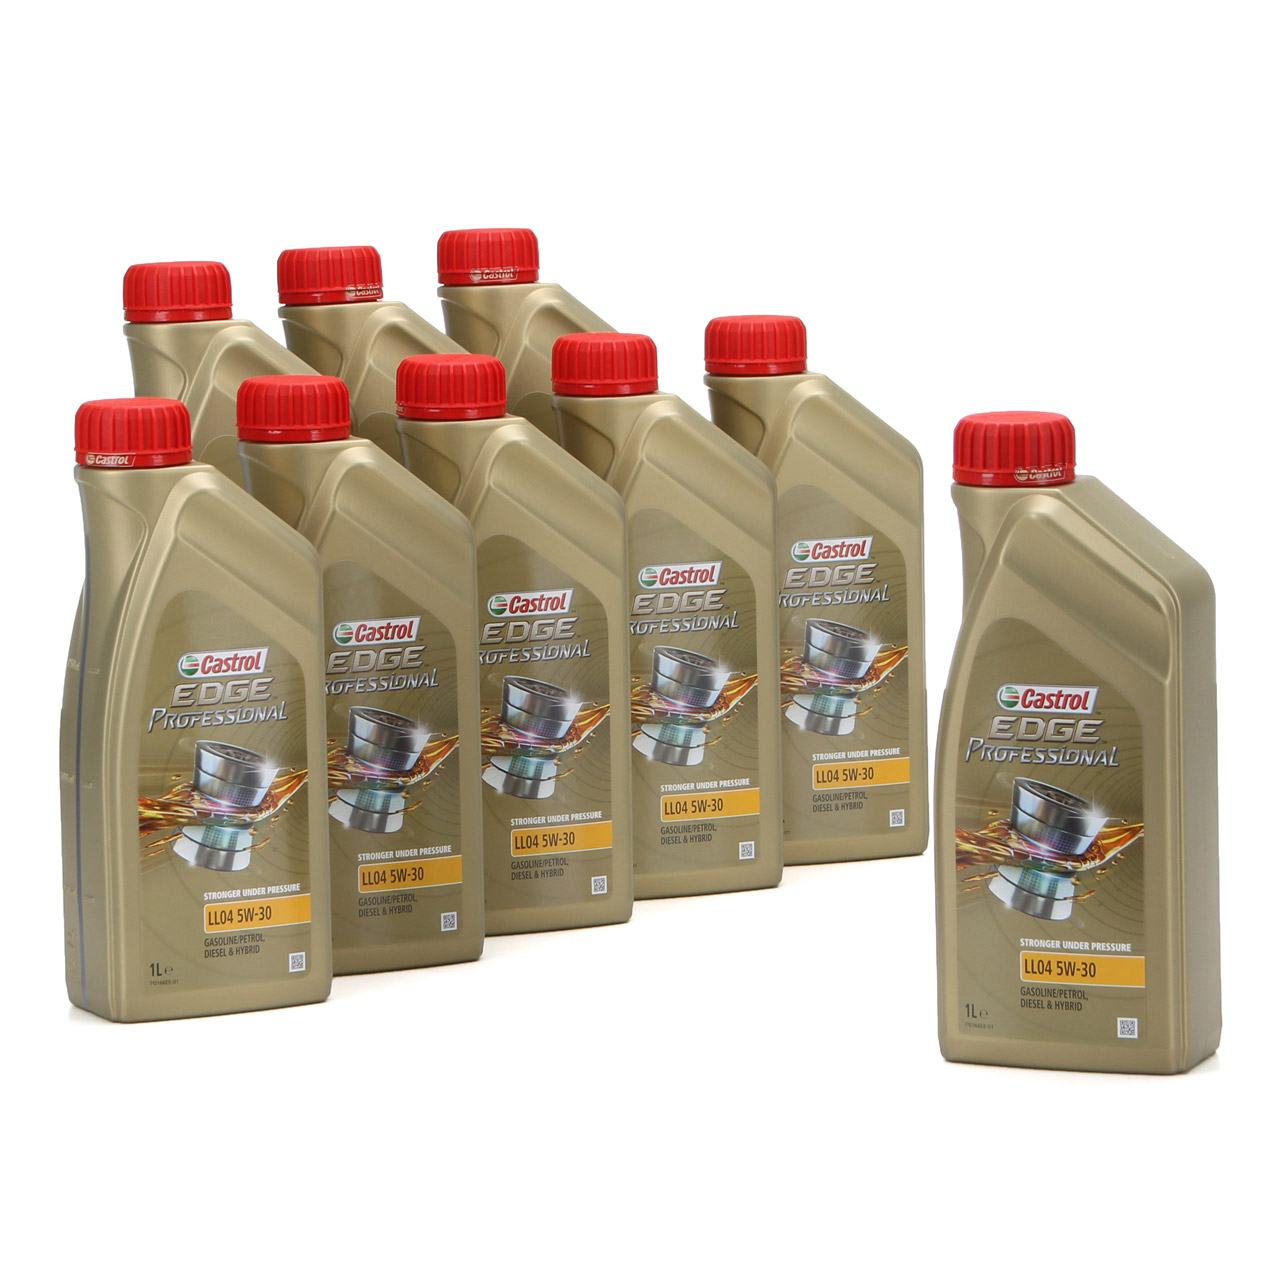 CASTROL EDGE Professional Motoröl Öl für BMW Longlife IV LL04 5W-30 - 9 Liter